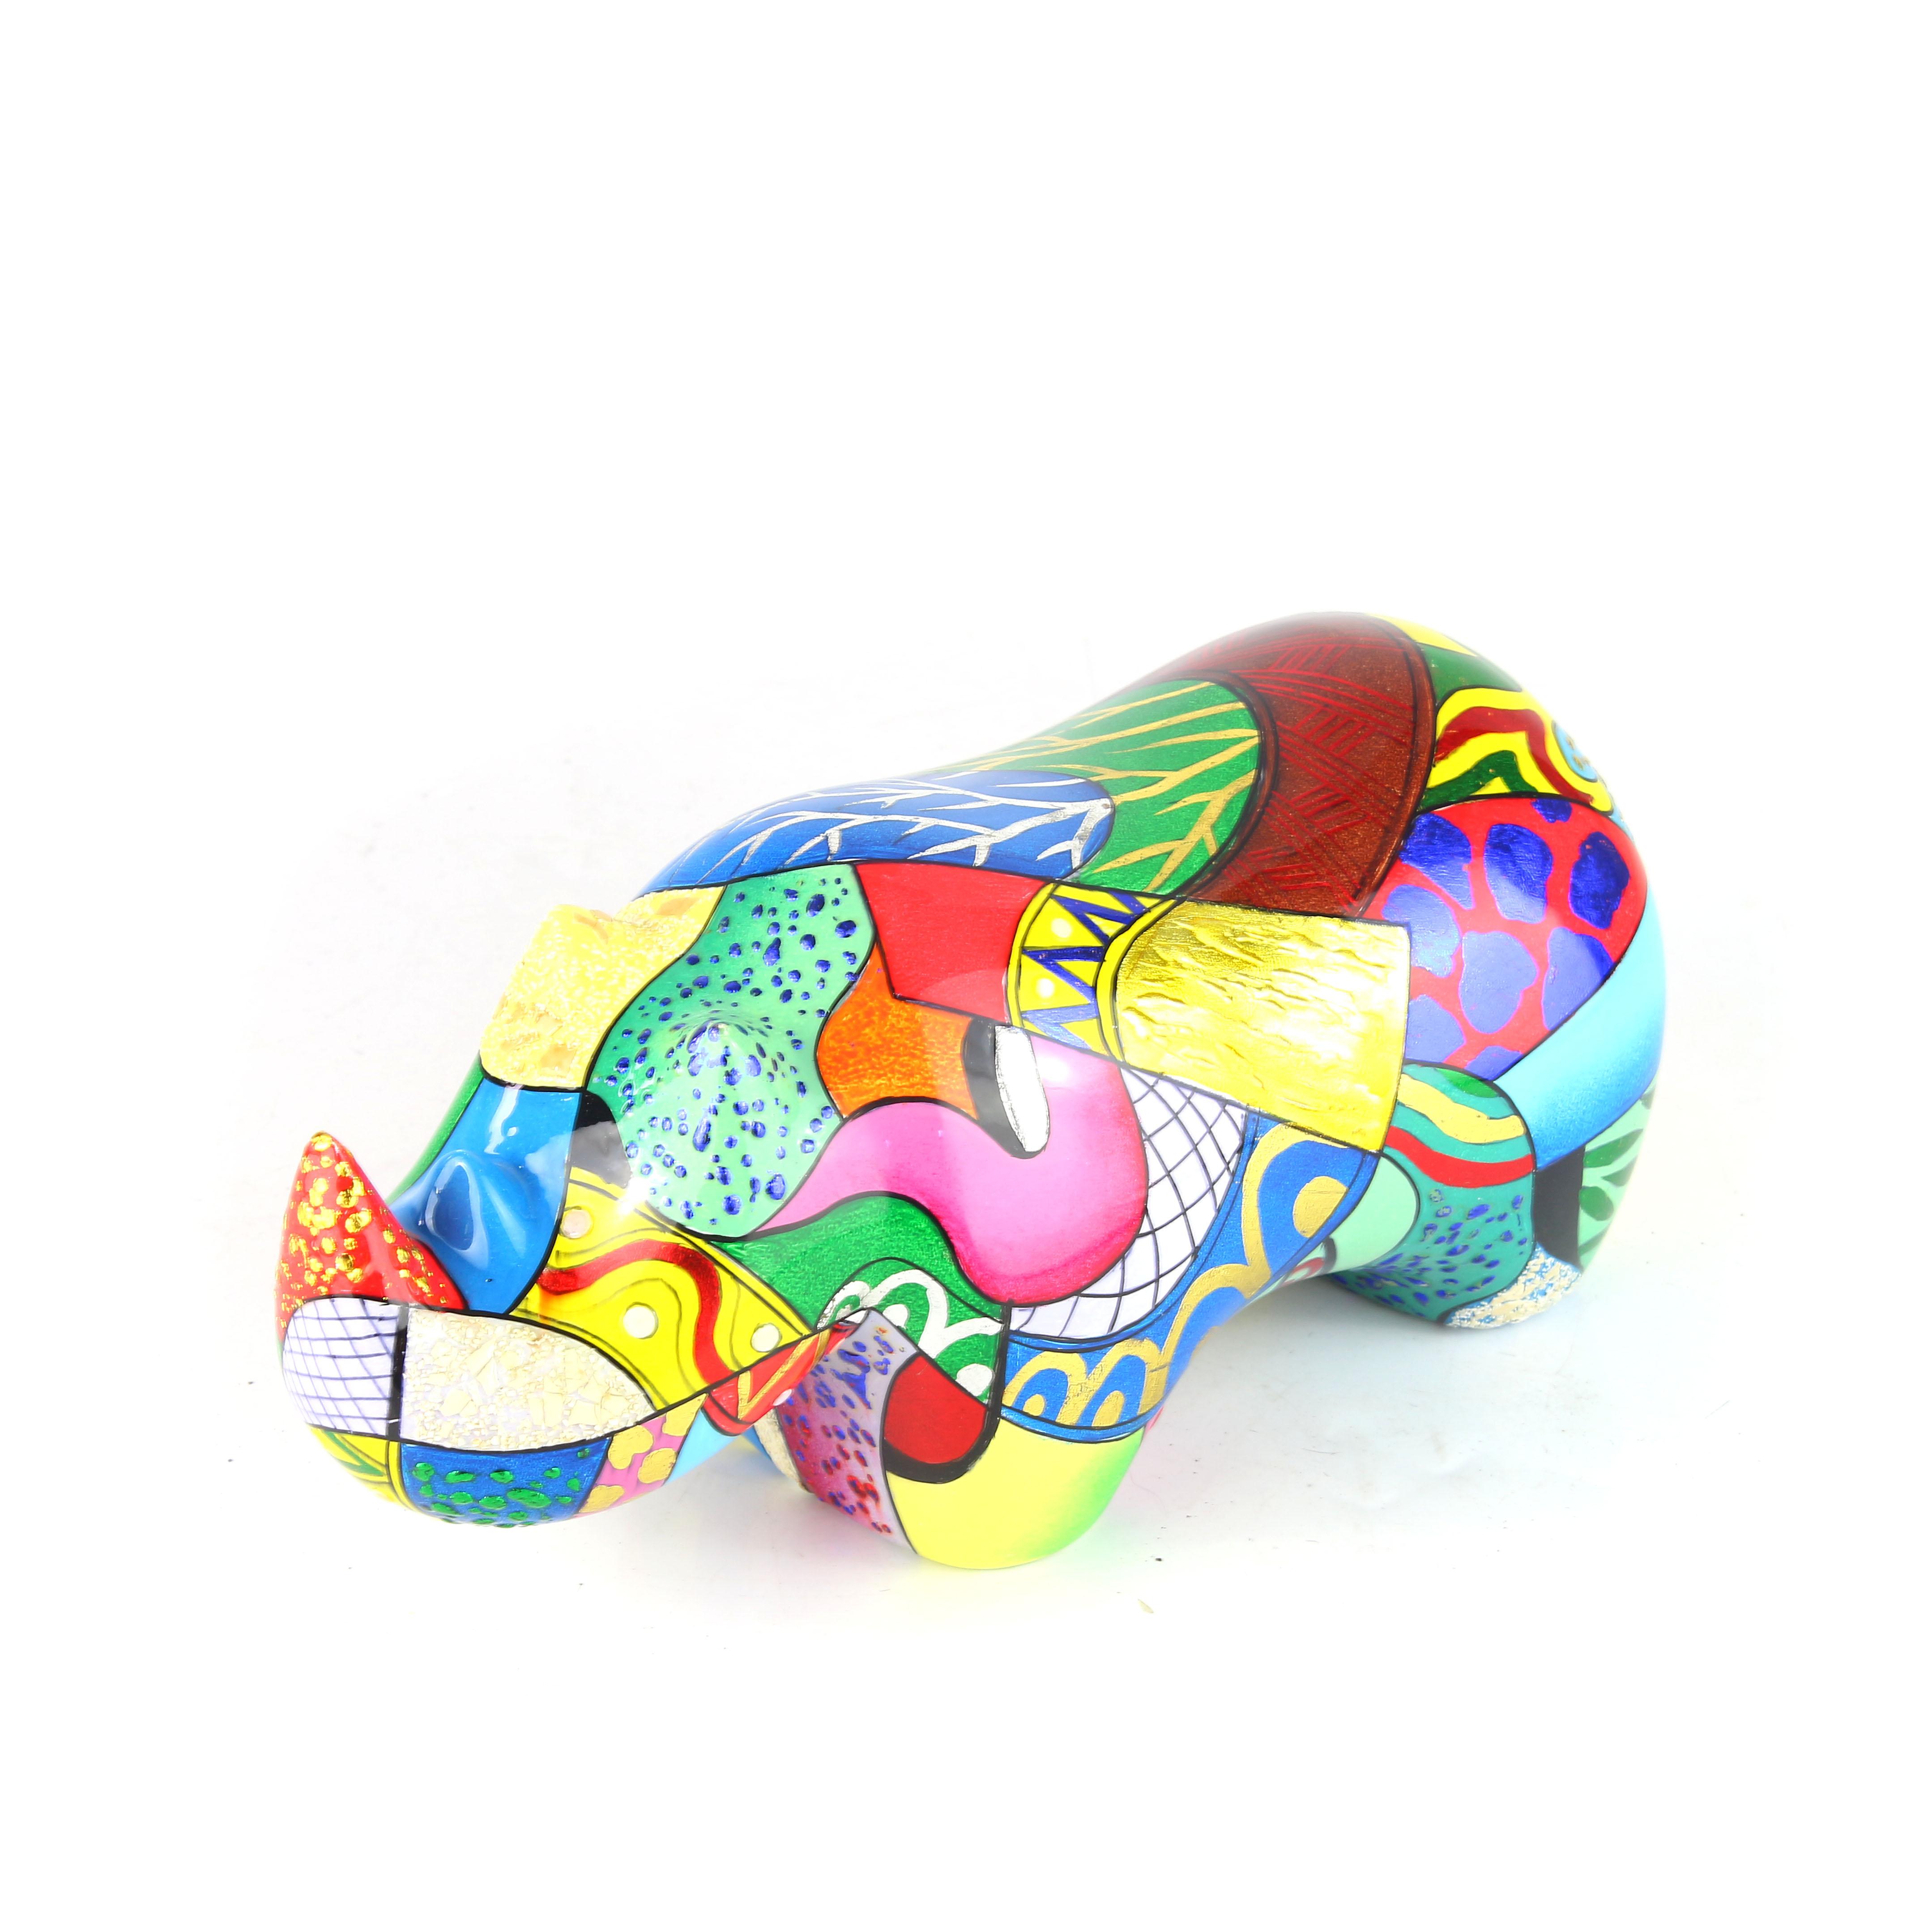 Painting Rhino Sculpture